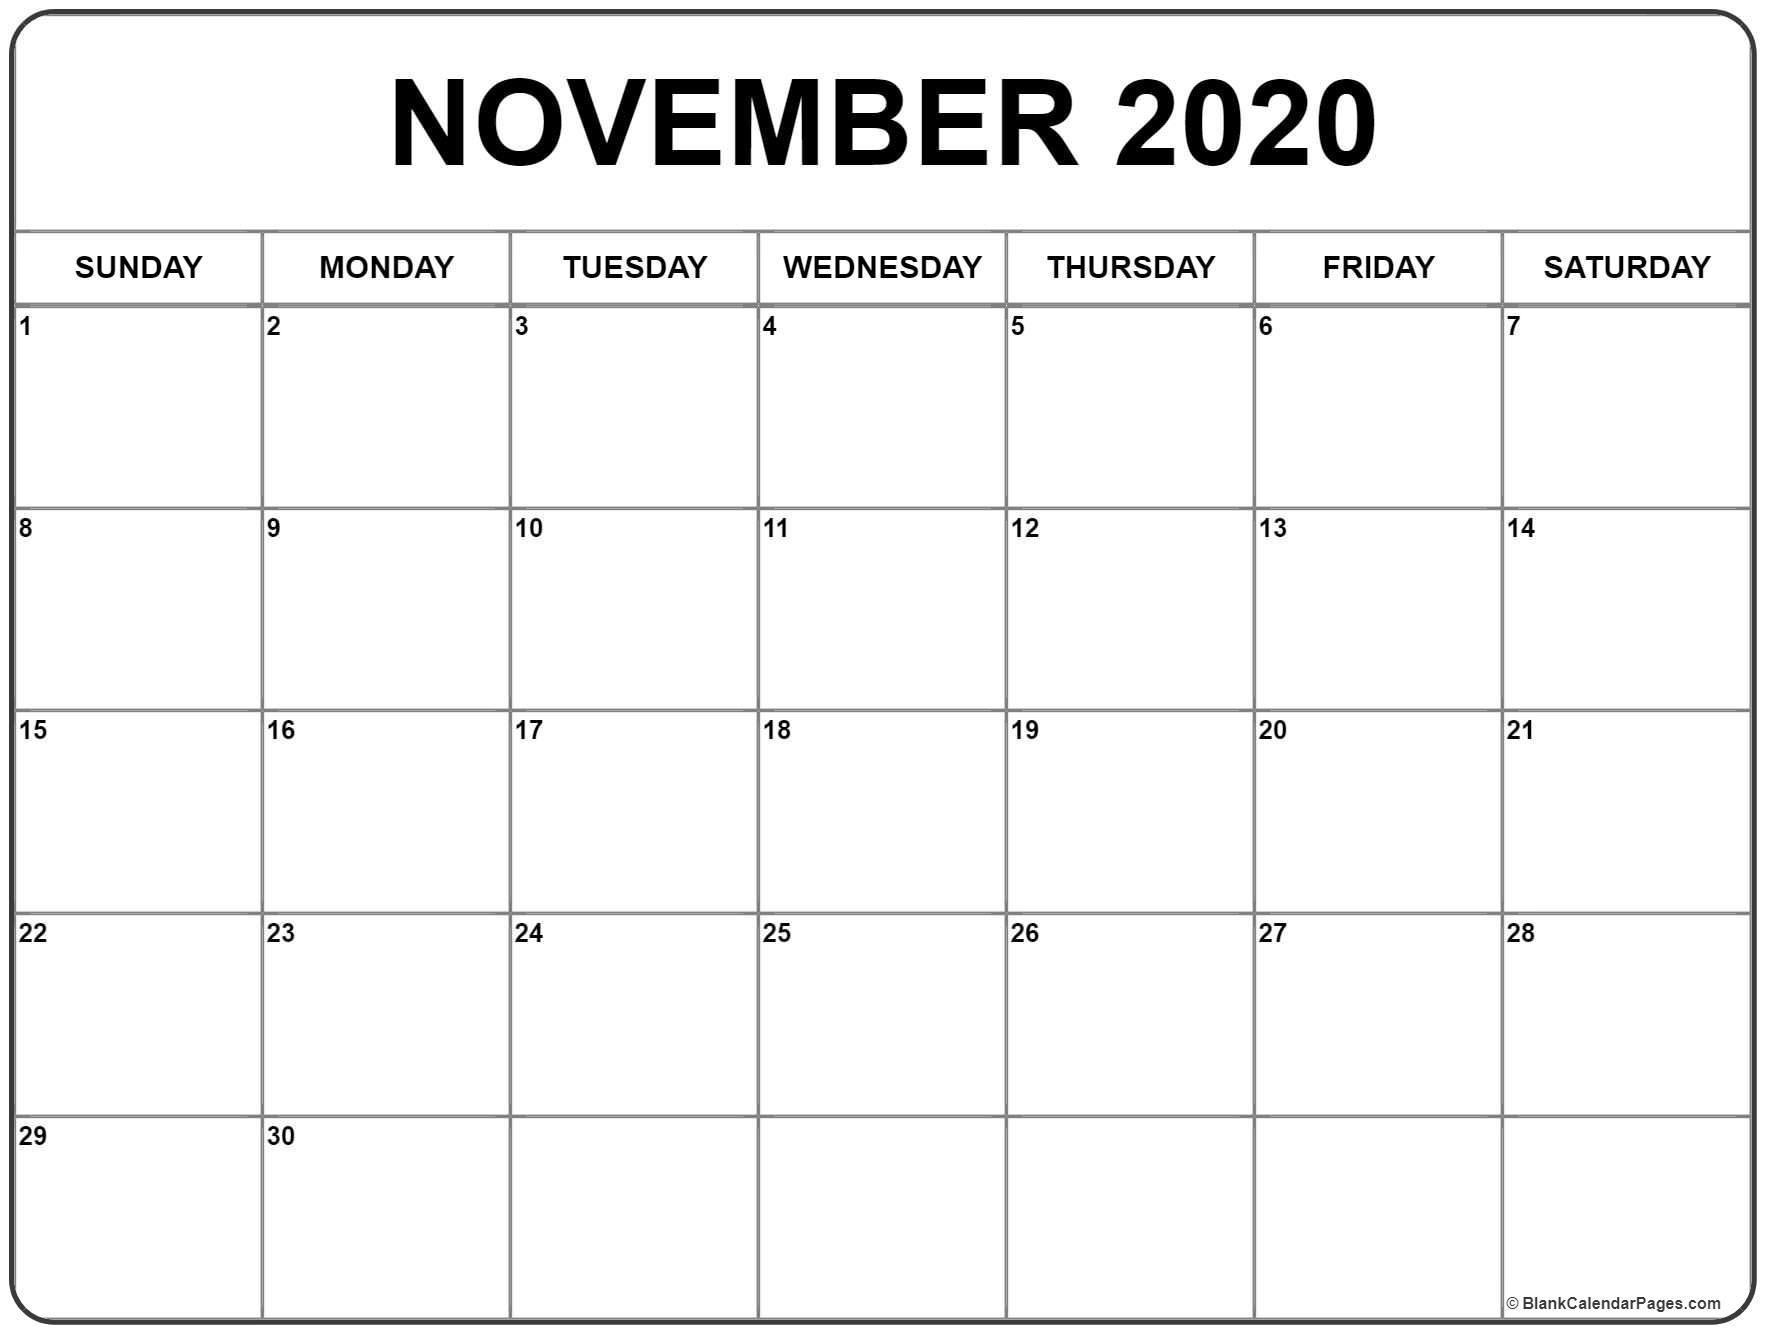 November 2020 Calendar | Free Printable Monthly Calendars_Calendar Blank November 2020